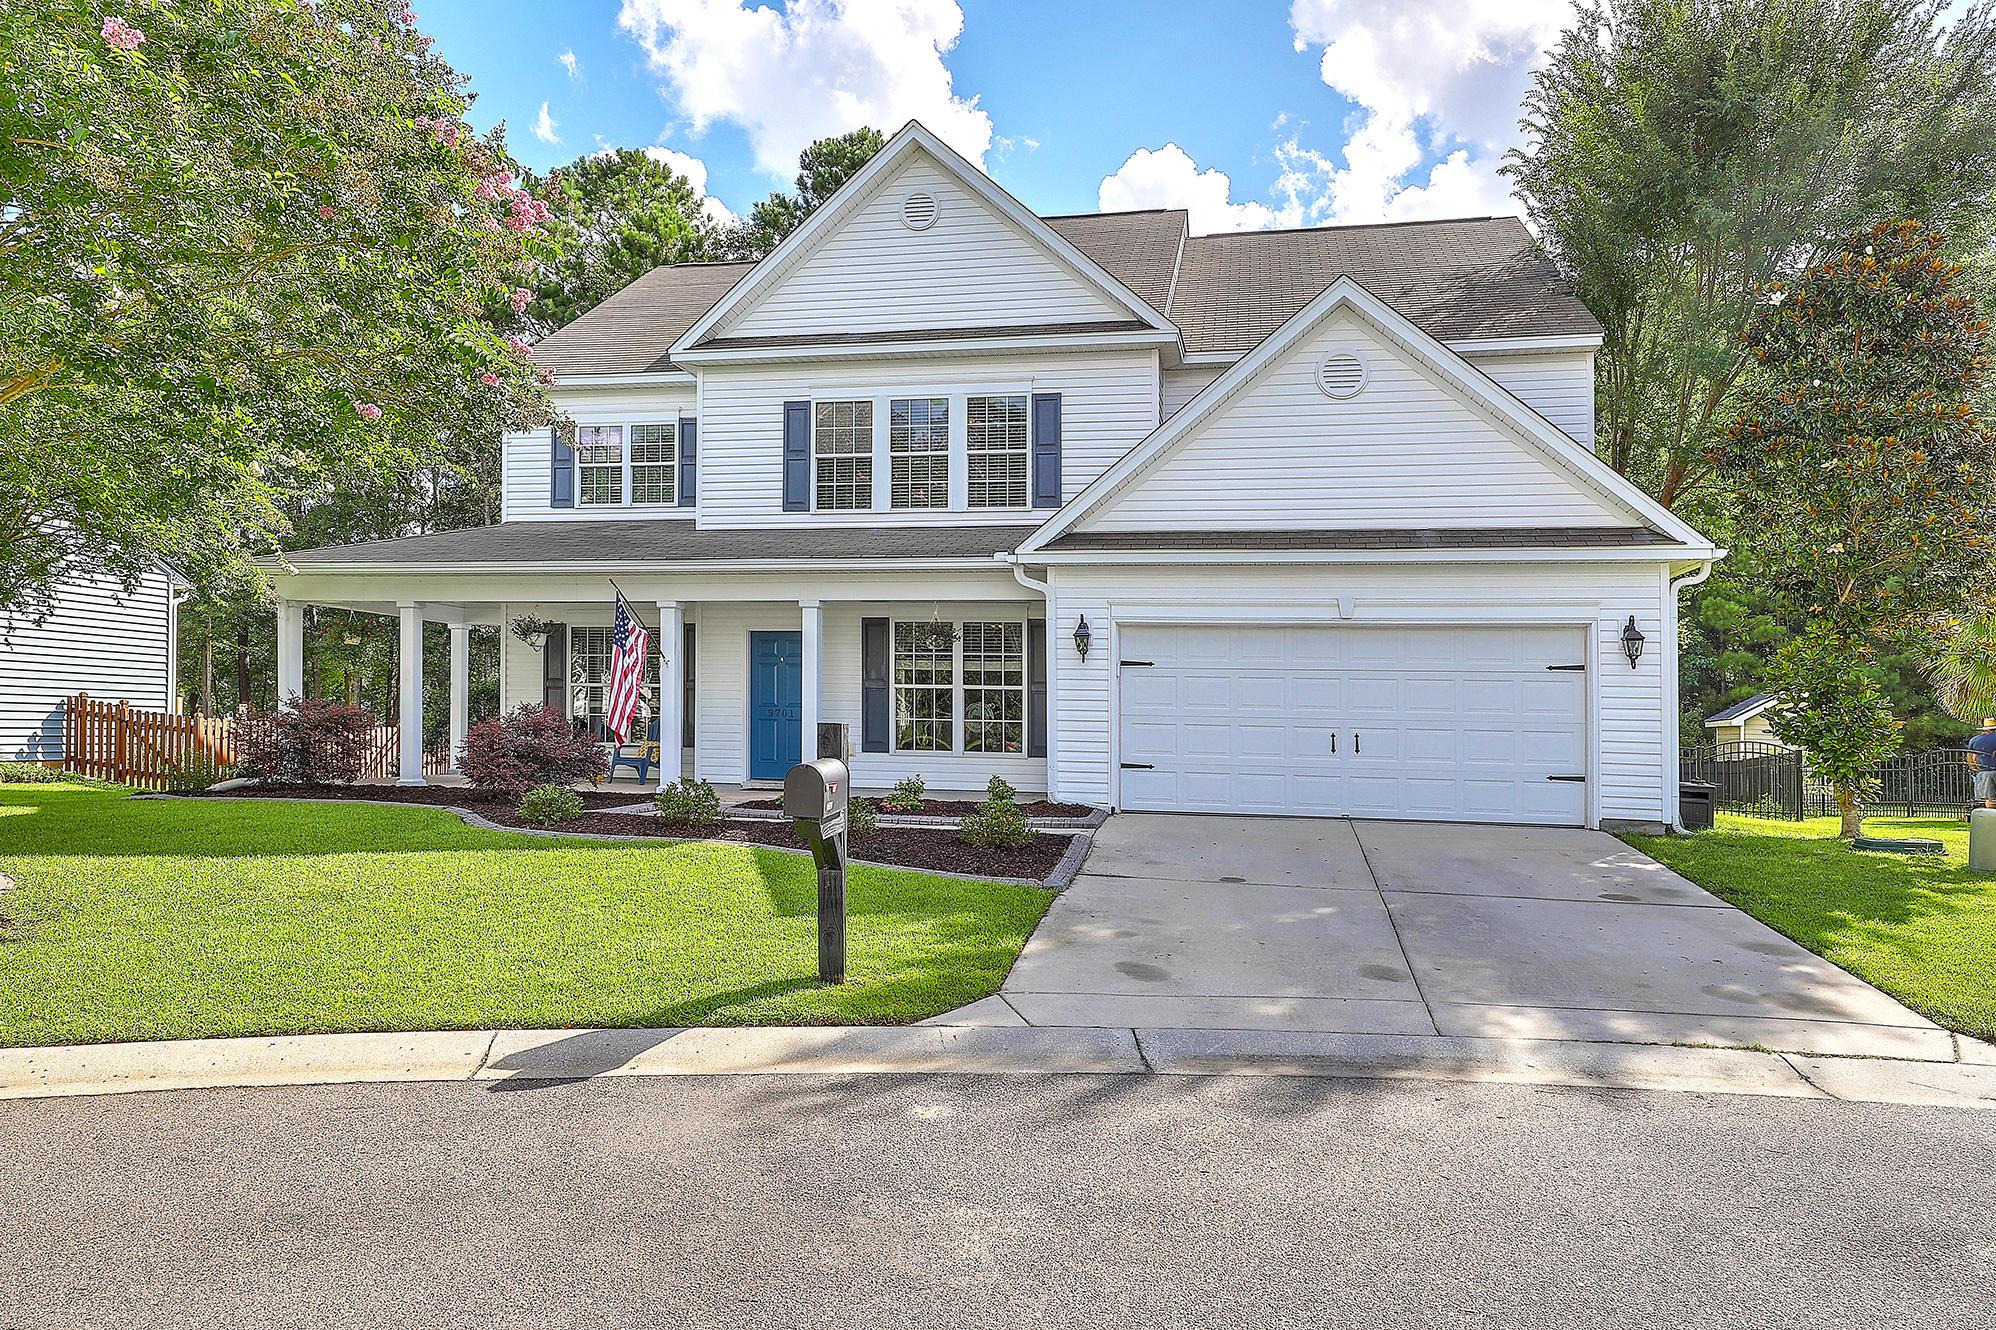 9701 Seminole Way Summerville, Sc 29485